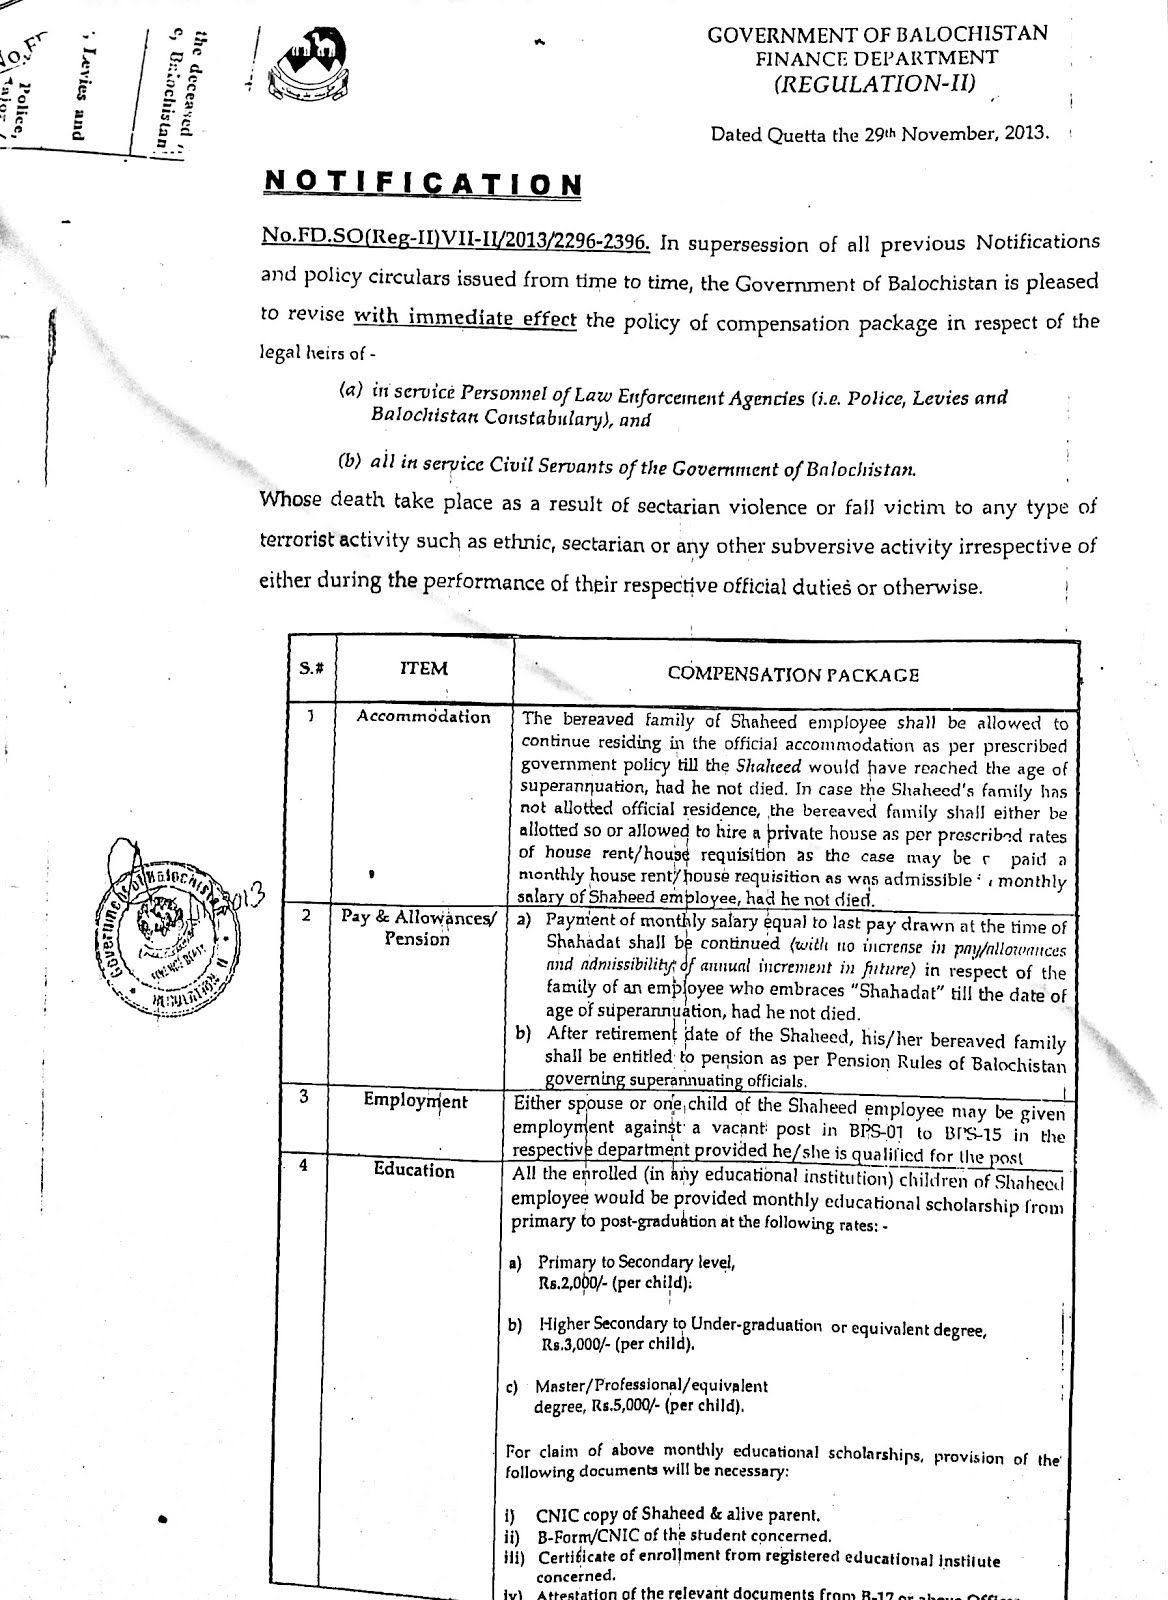 bank exam notifications in november 2013